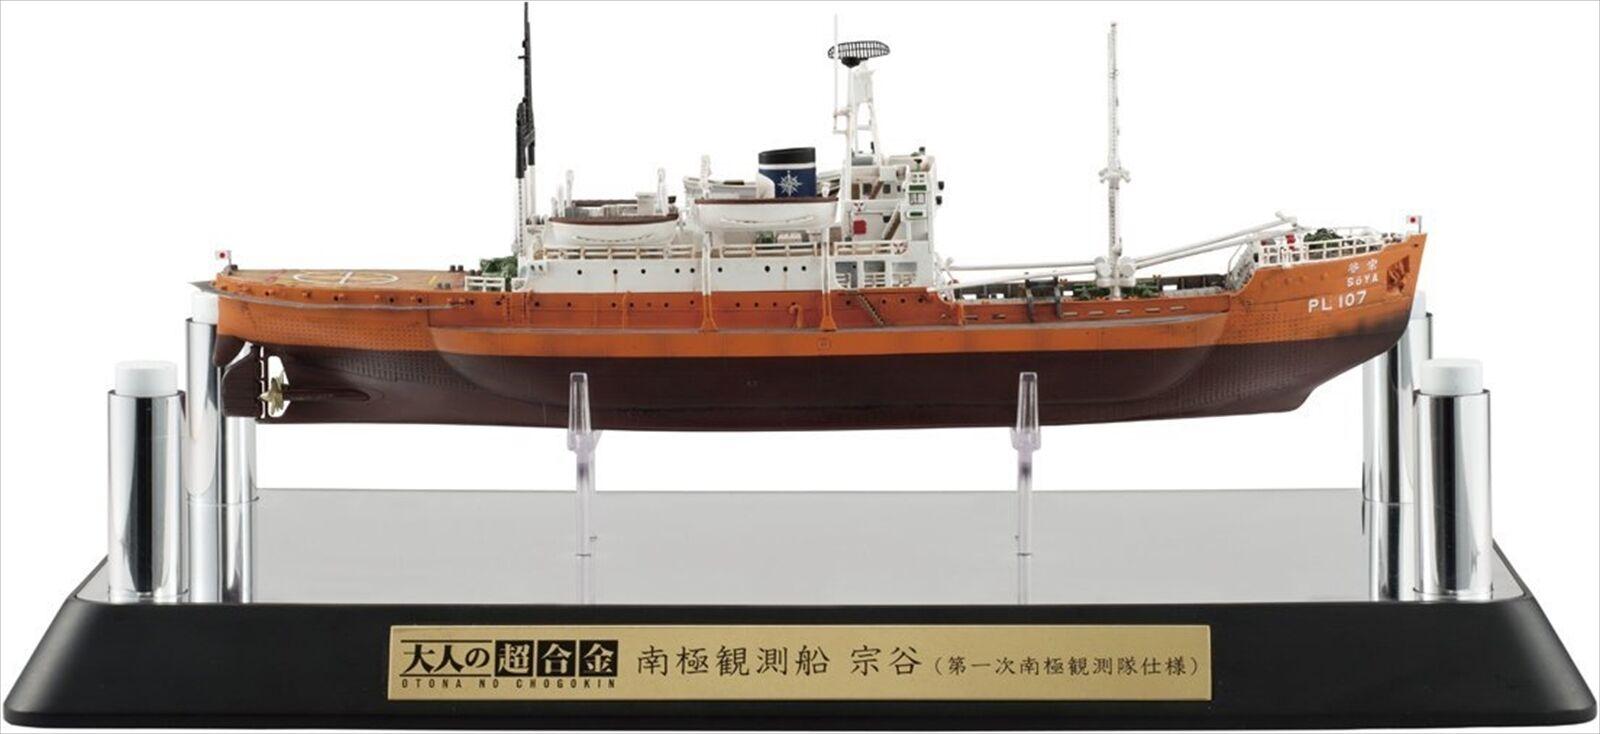 Bandai Otona No Chogokin Antártico buque de investigación soja 1 250 Figura De Acción